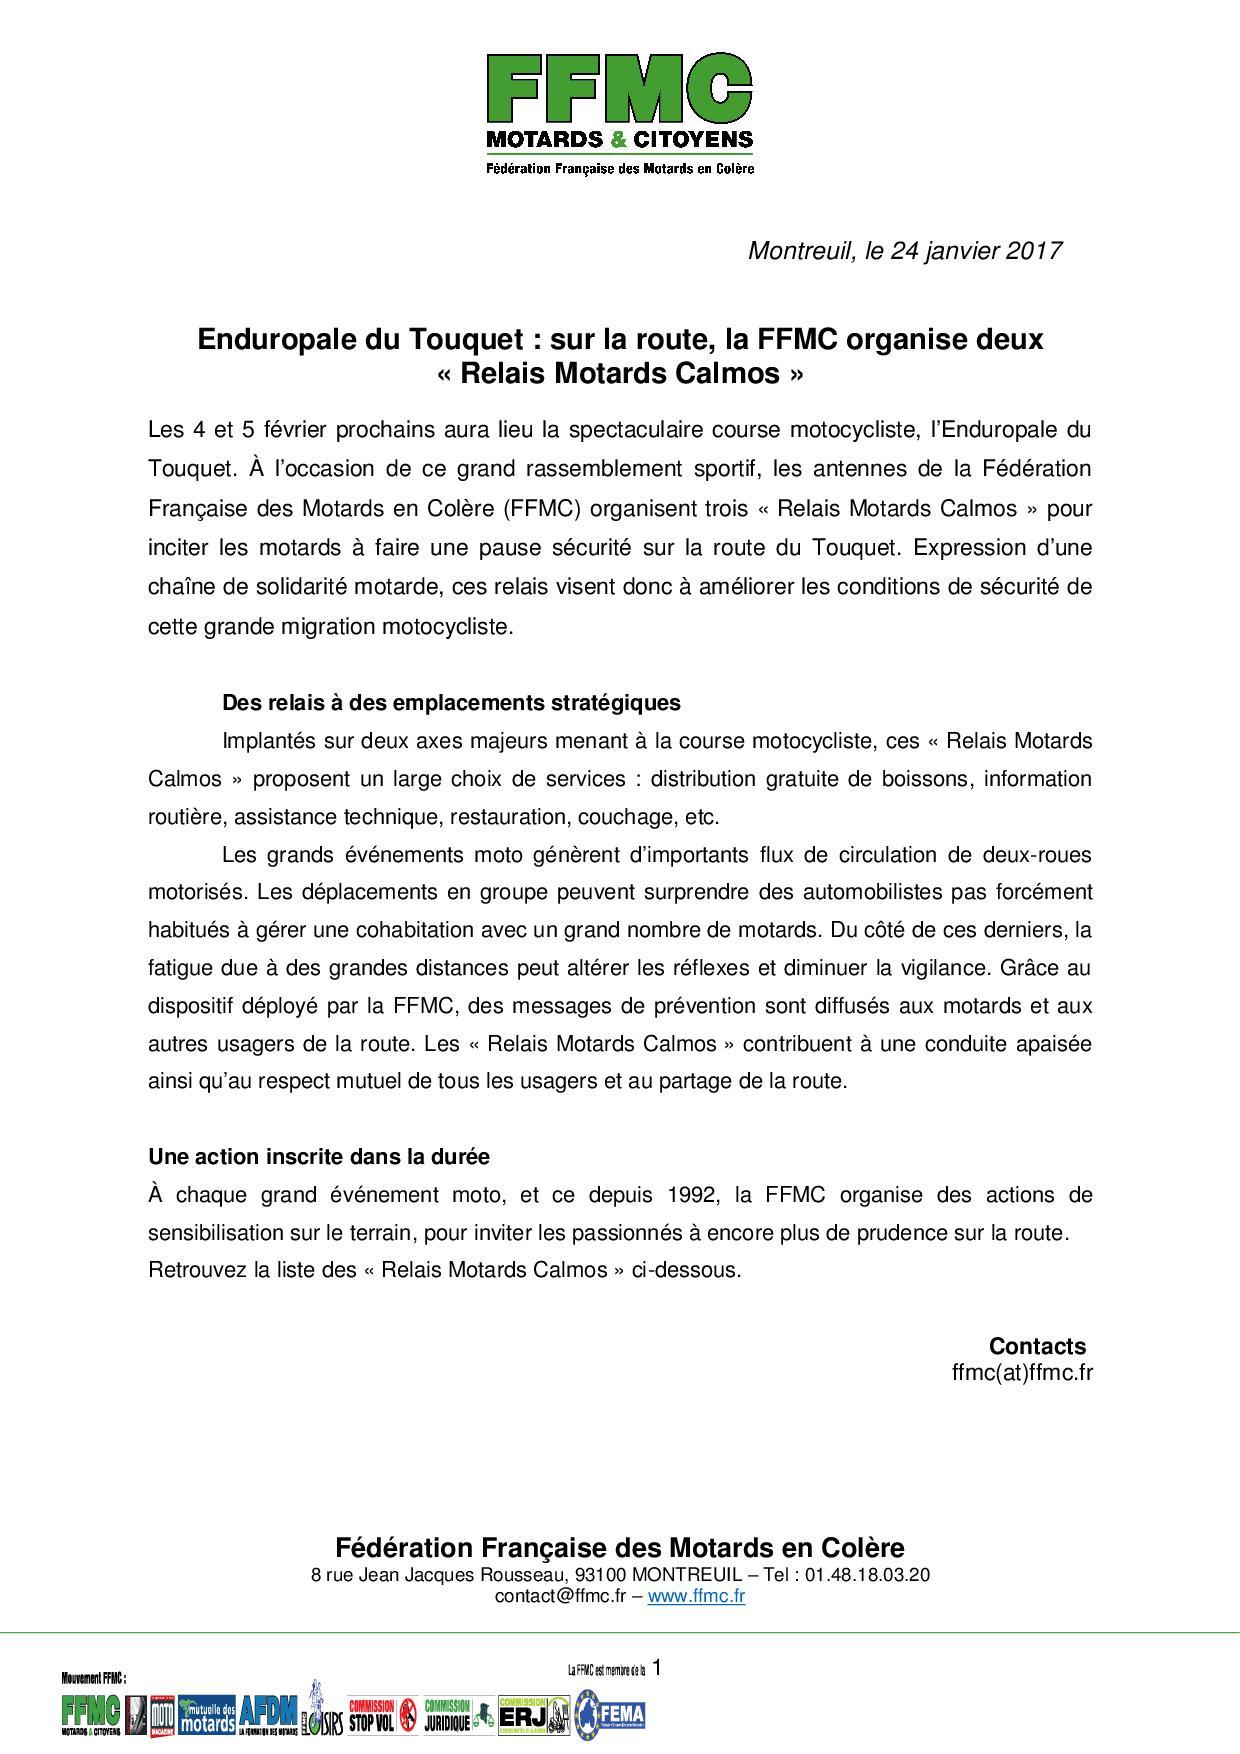 FFMC59_2017-01-24_communique_enduropale_relais_calmos1